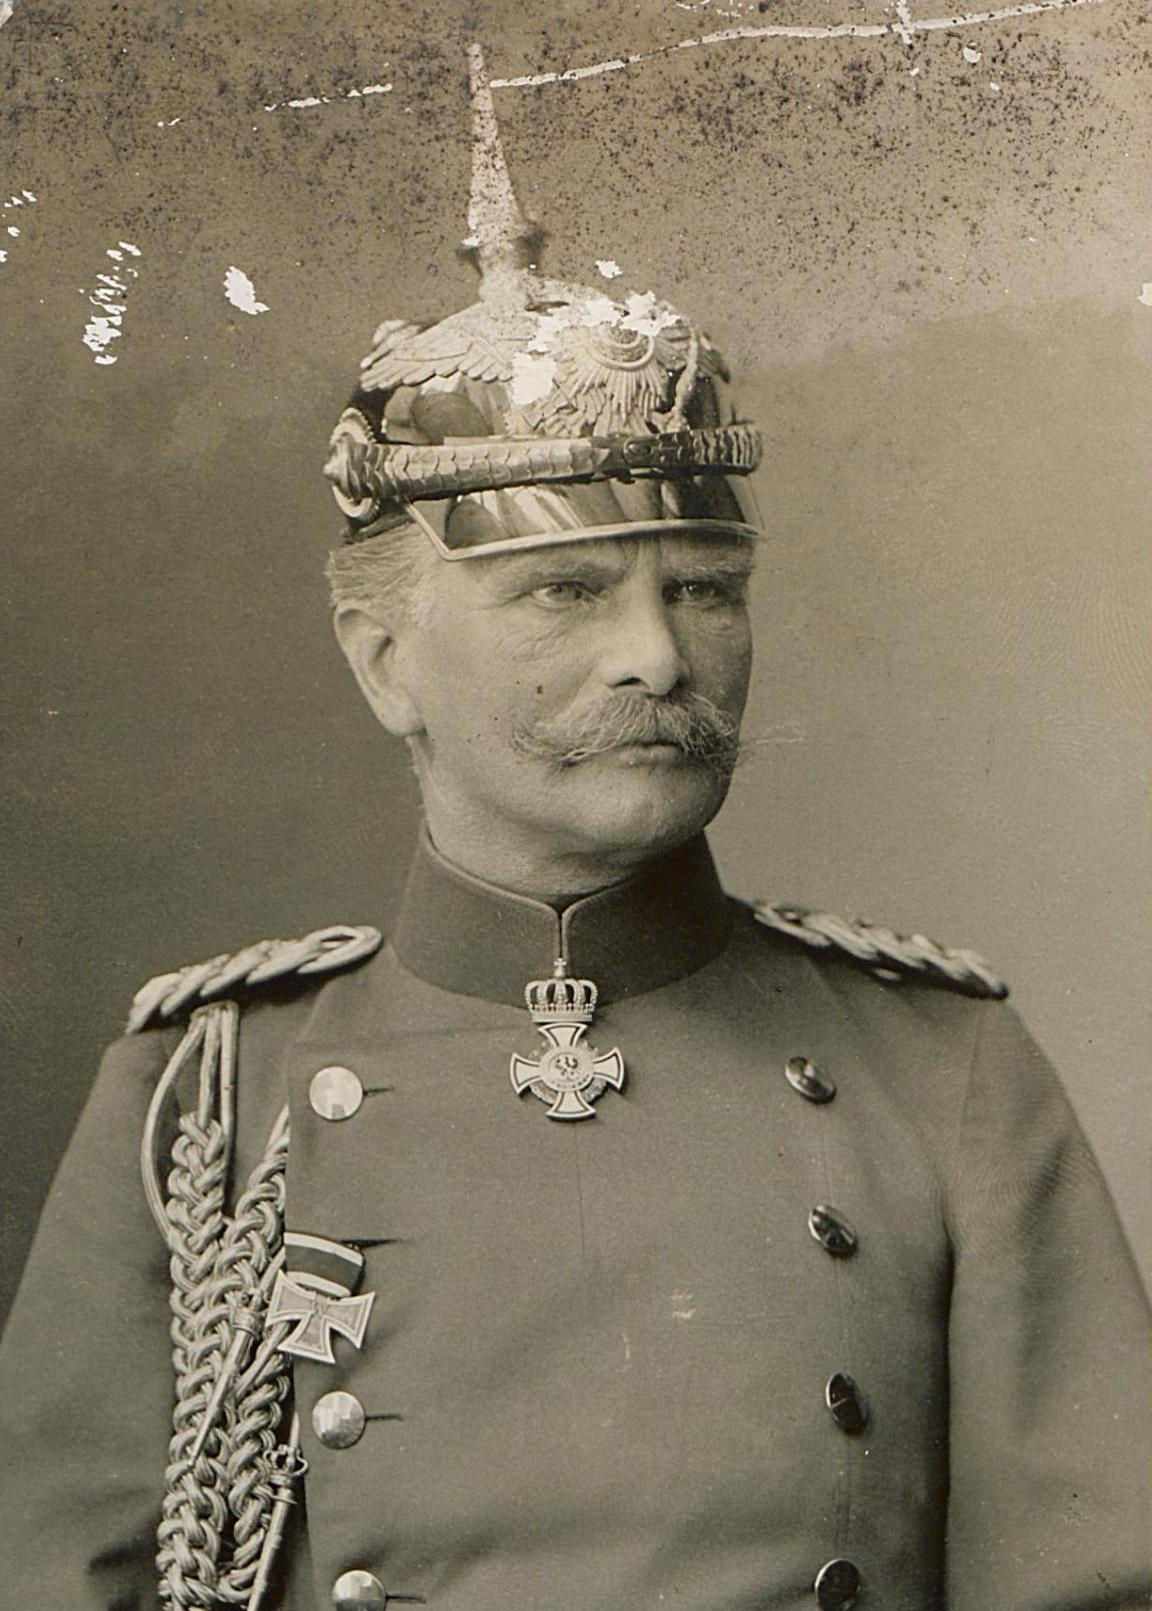 Генерал Август фон Макензен. Фото 1910-х гг.